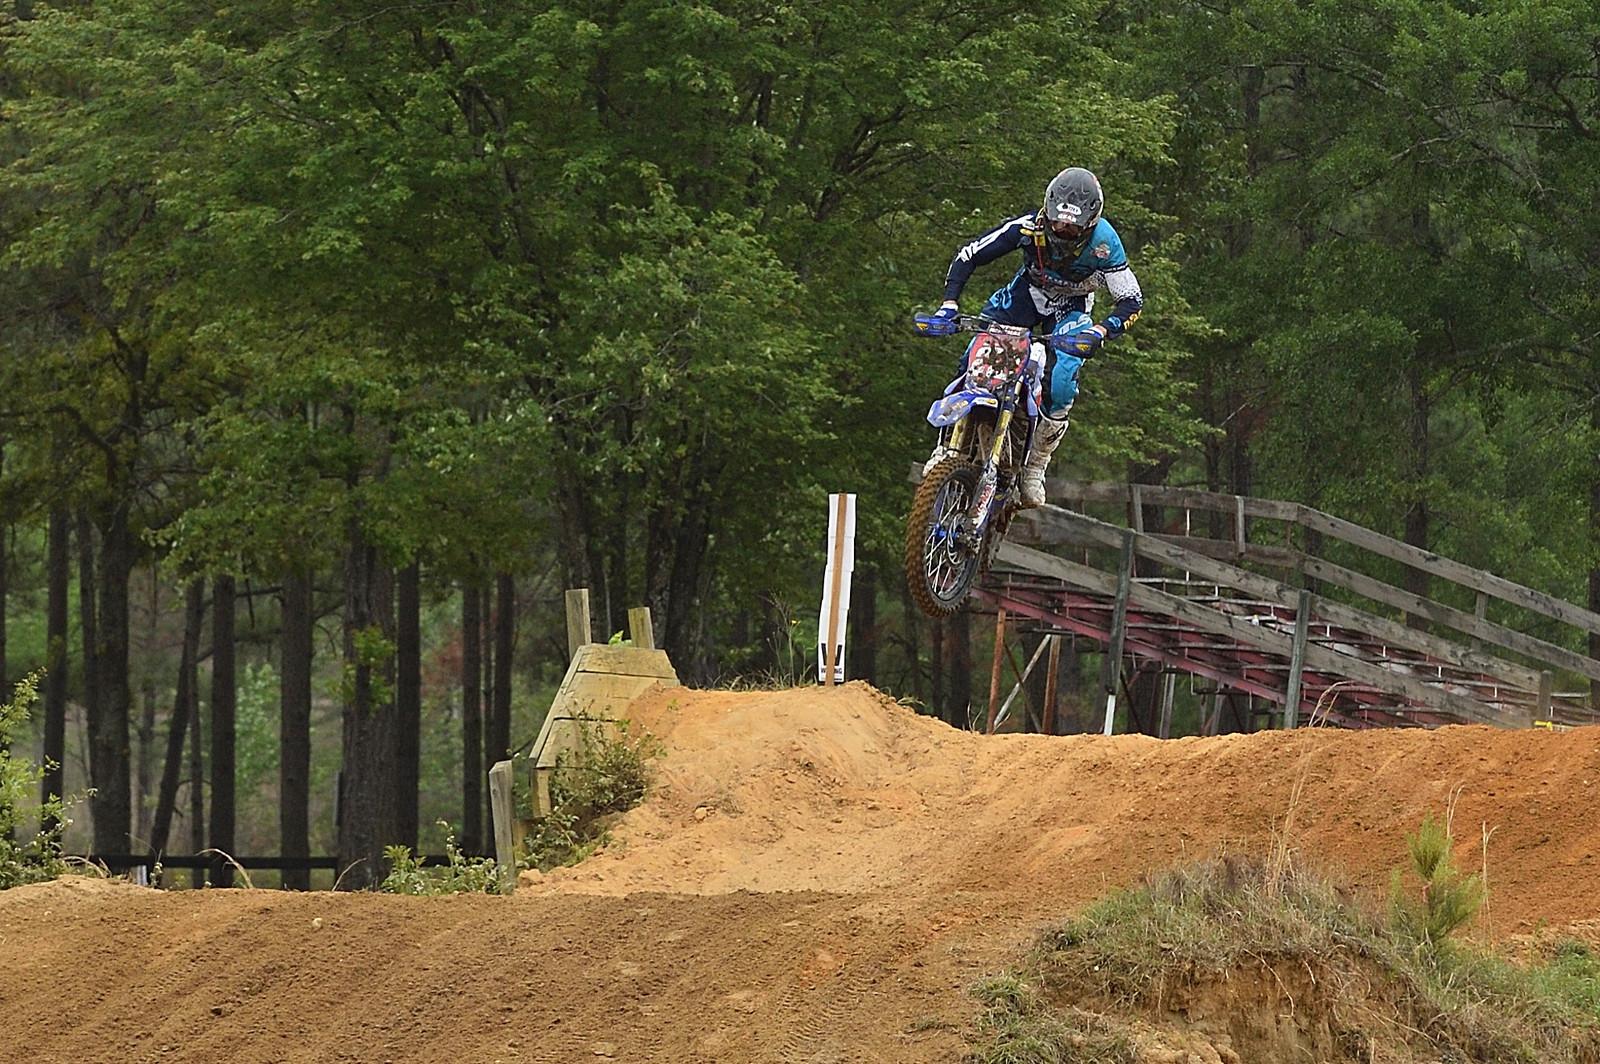 JBU 8277 - GuyB - Motocross Pictures - Vital MX